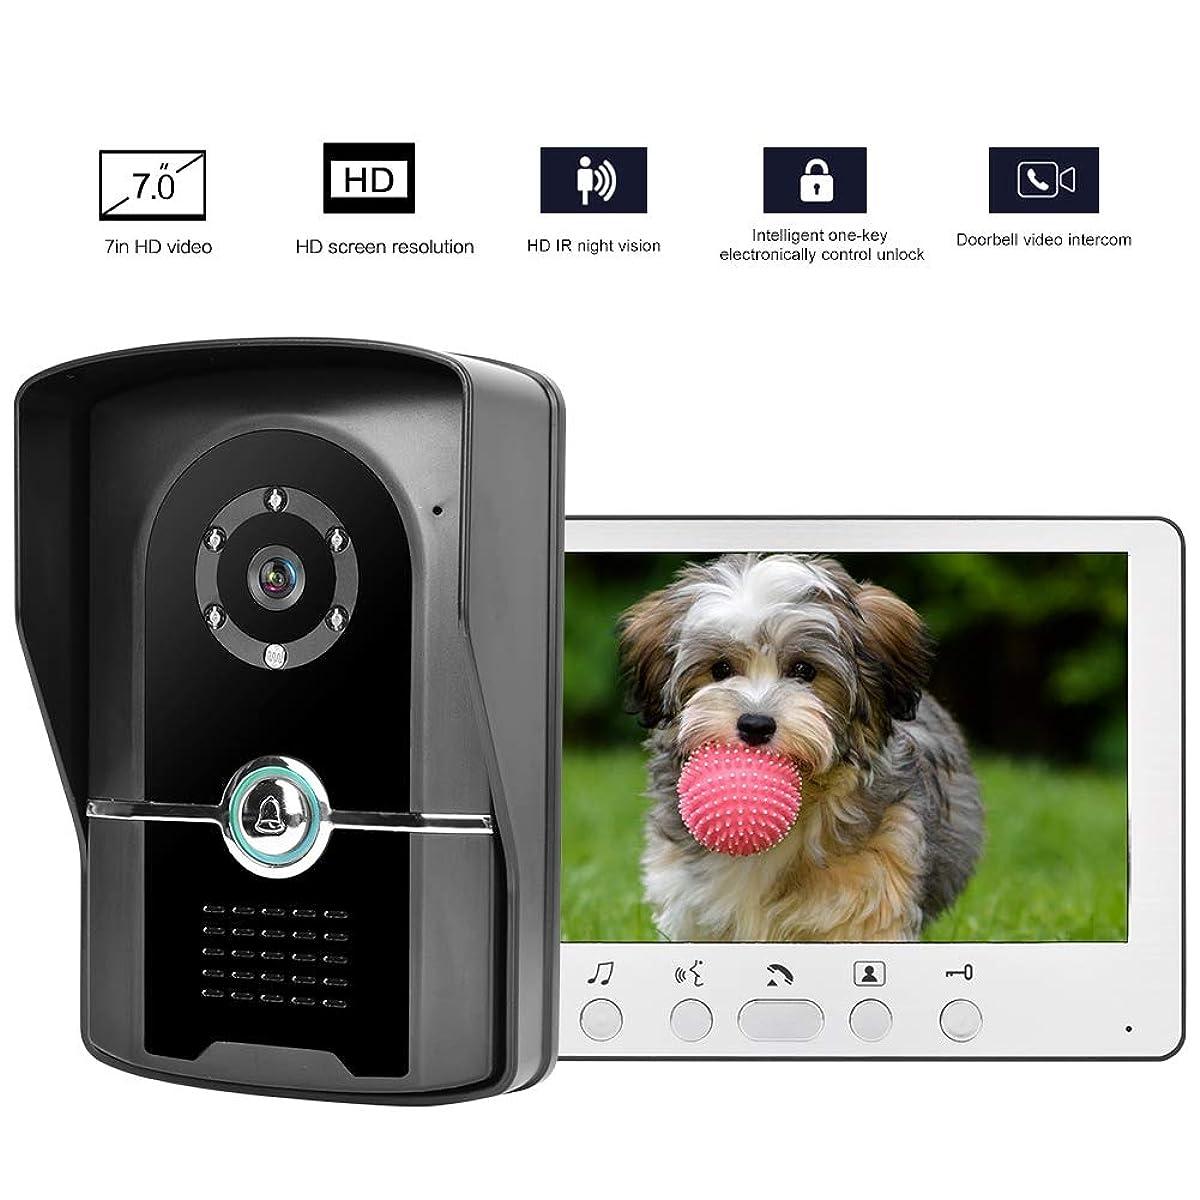 Bewinner Video Door Phone Intercom System, 7in TFT LCD Night Vision Wired Doorbell,Call Intercom,Hands-Free Intercom,Monitoring, Unlock,Highly Waterproof Outdoor Unit(US)